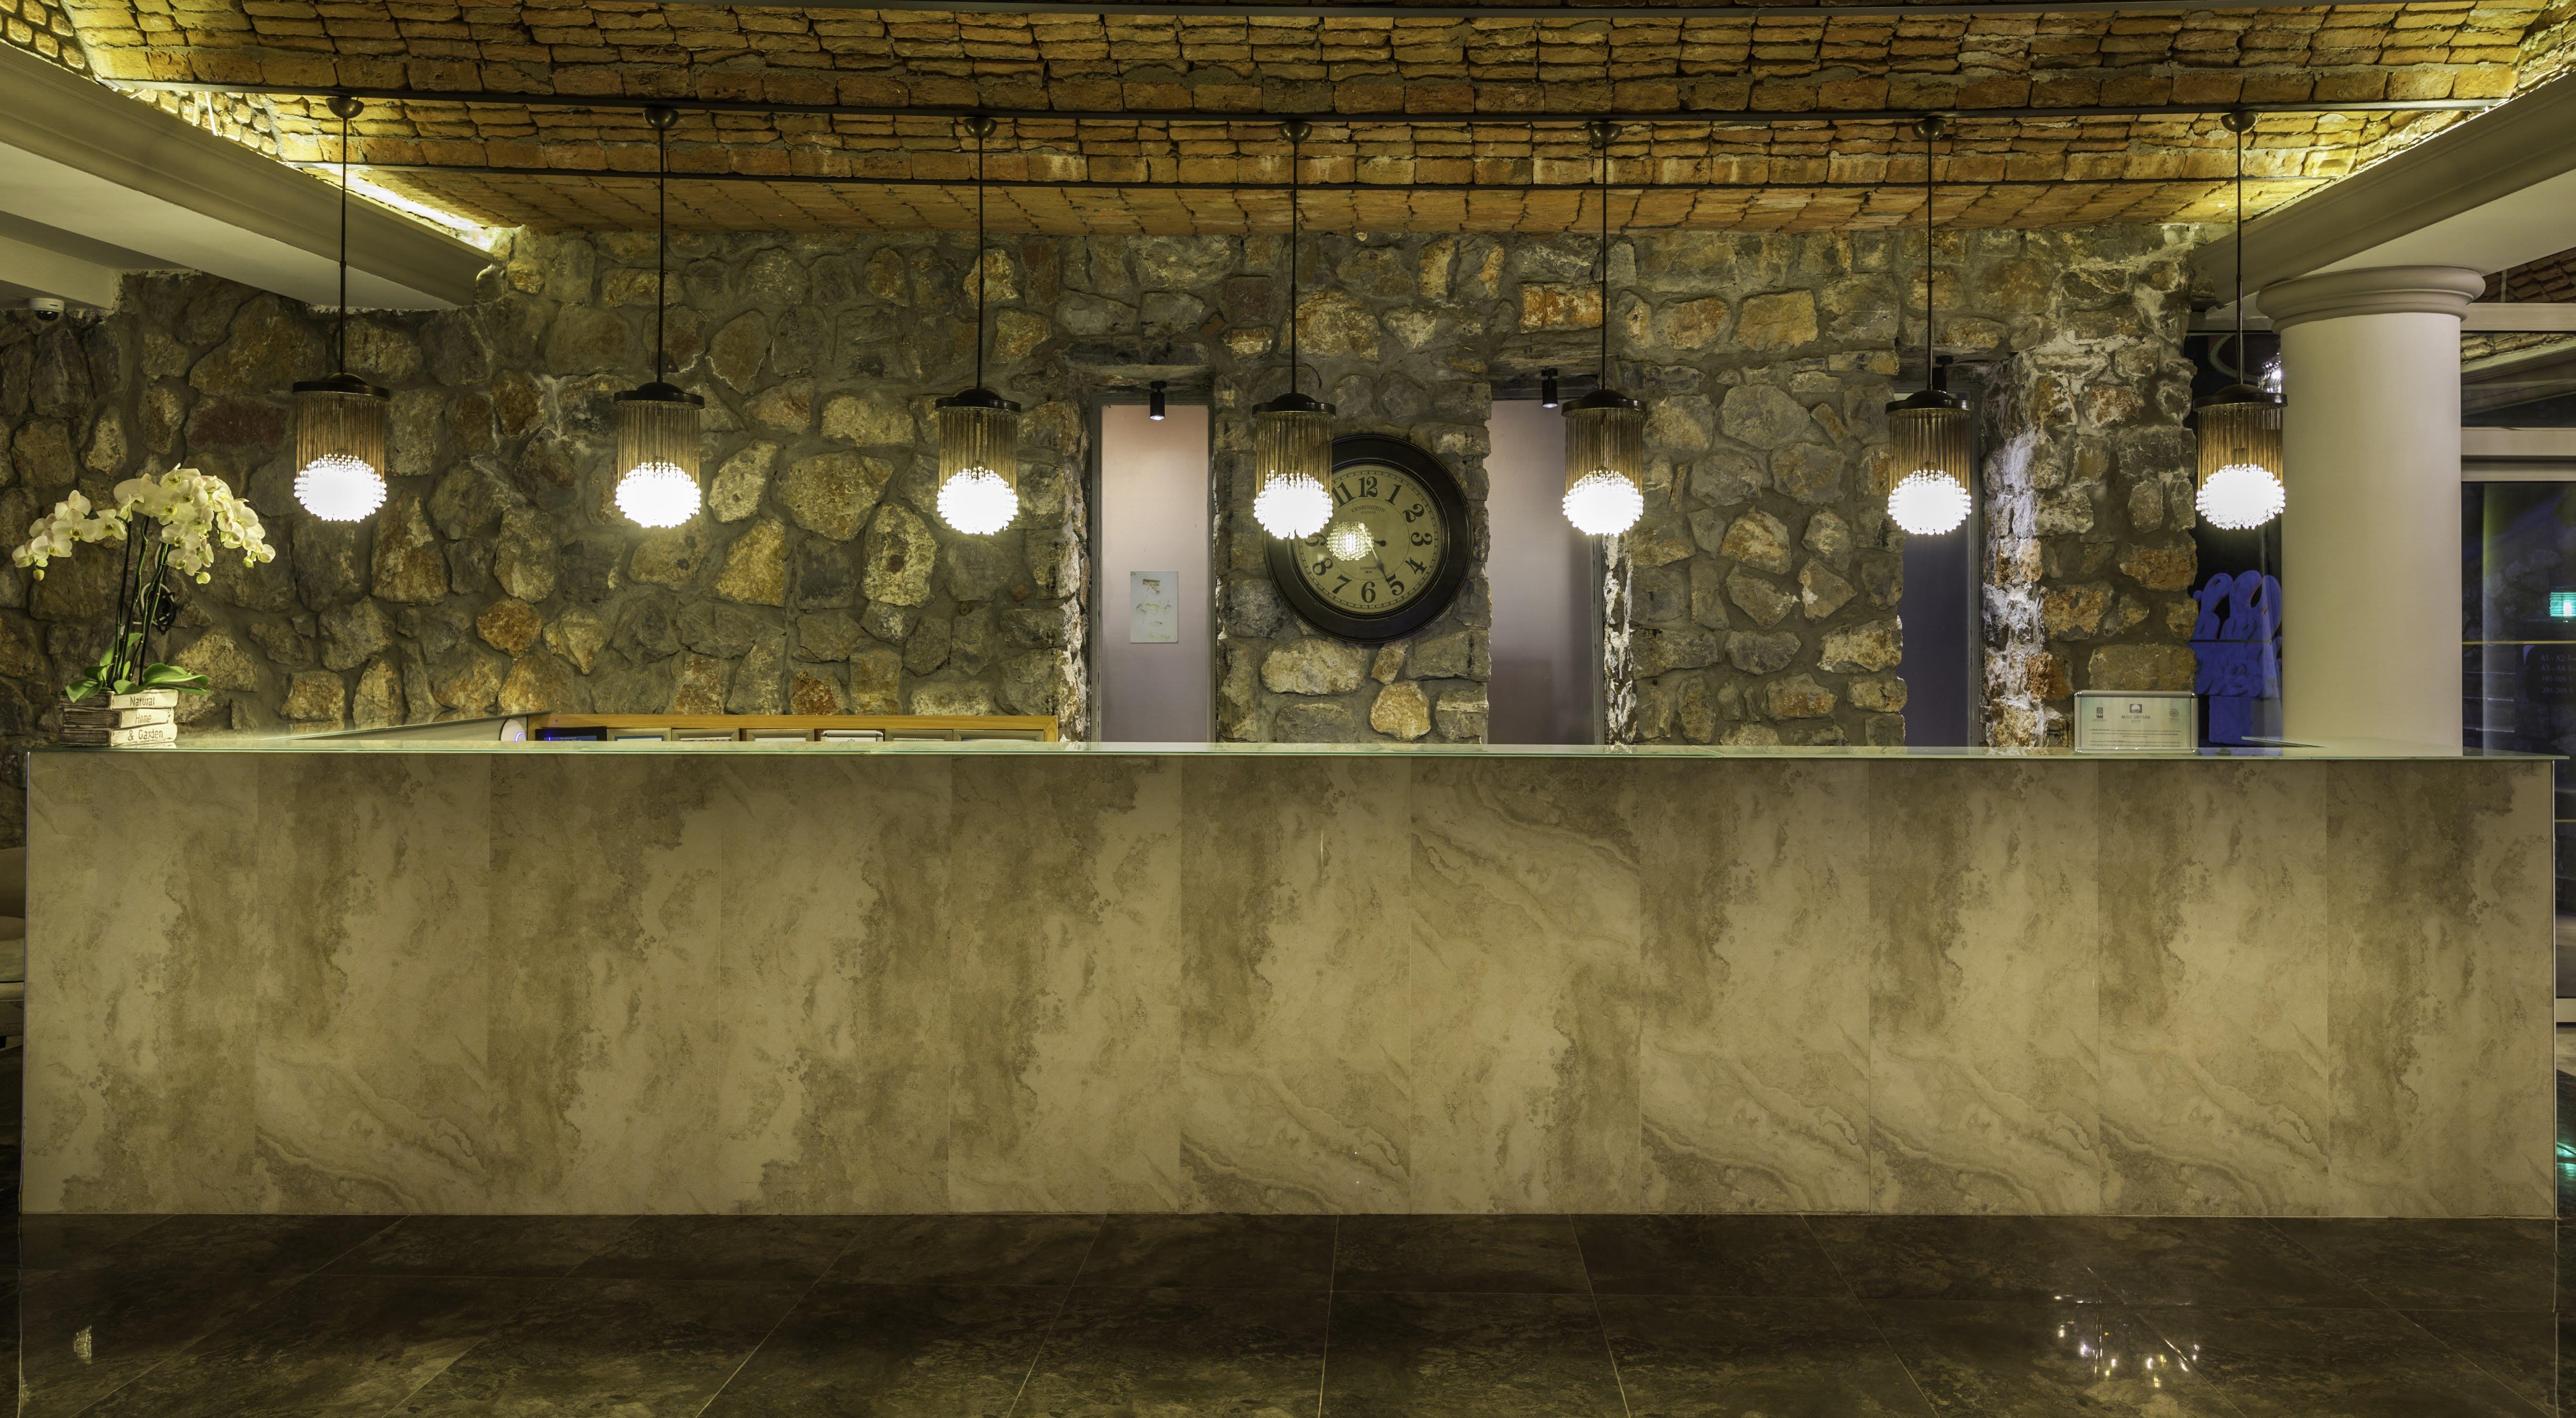 kairaba-blue-dreams-club-hotel-genel-0010